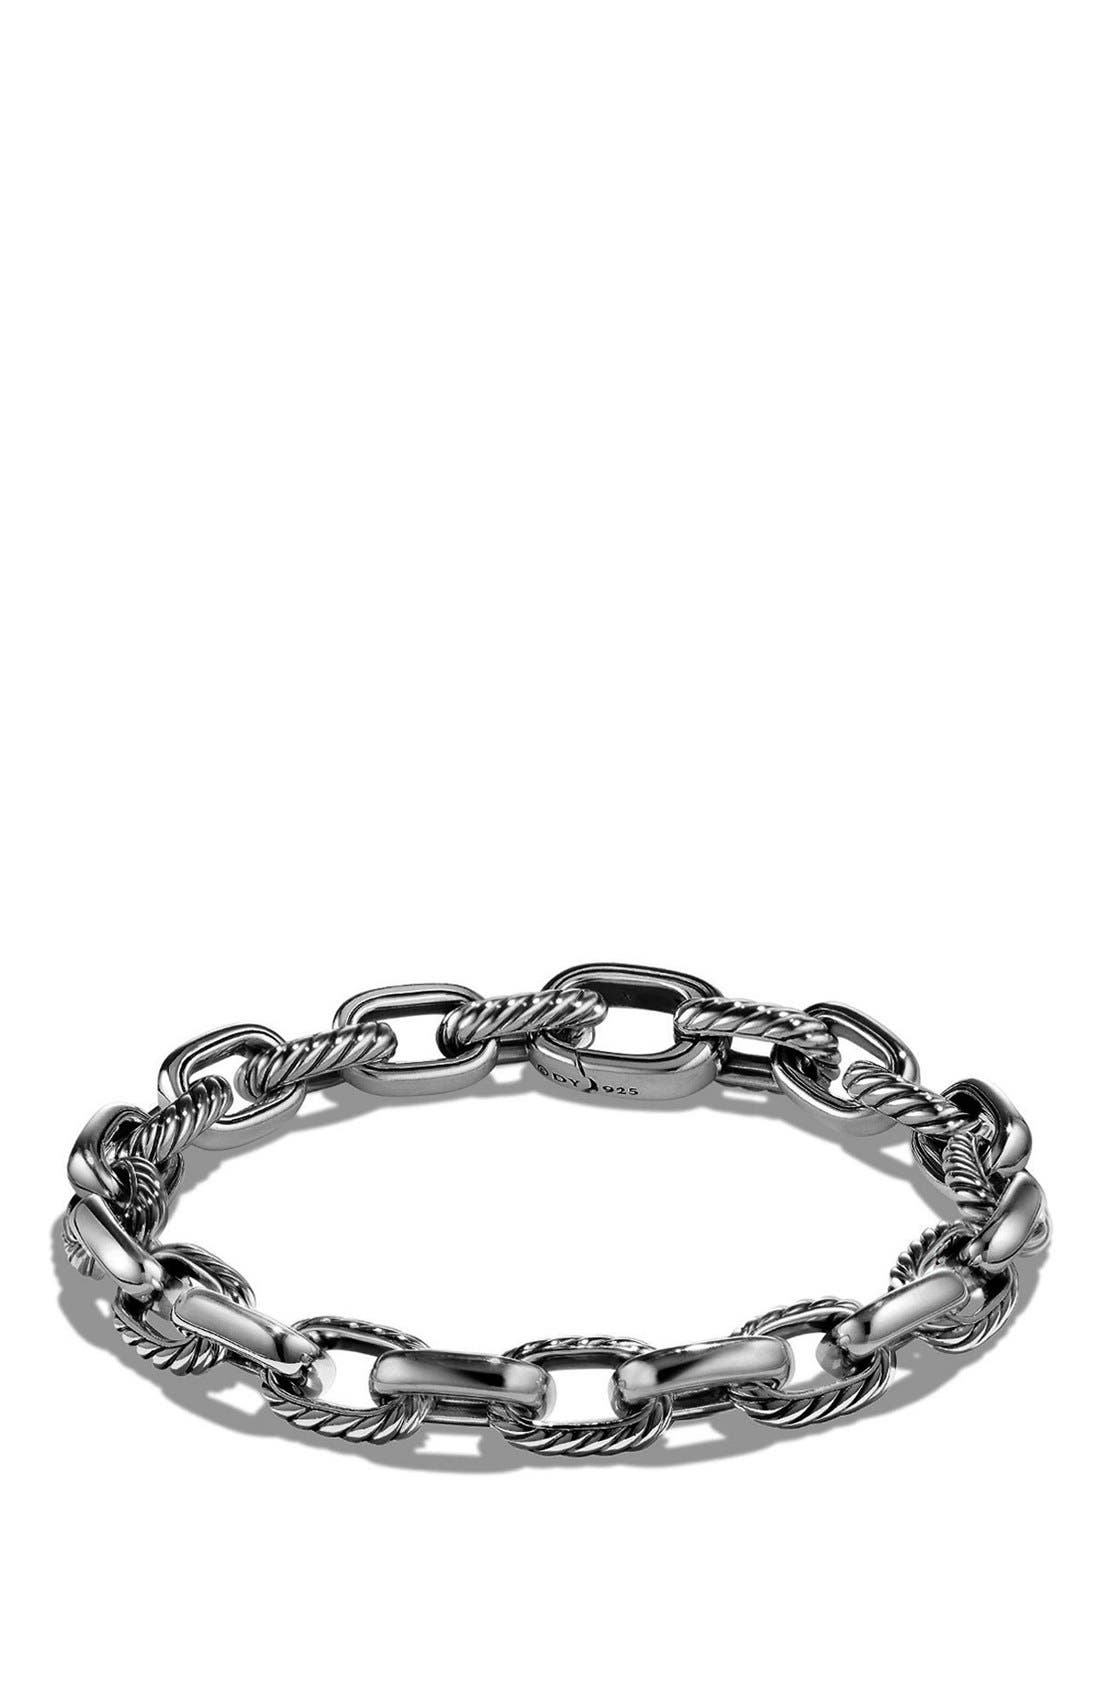 David Yurman 'Cable Classics' Oval Link Bracelet